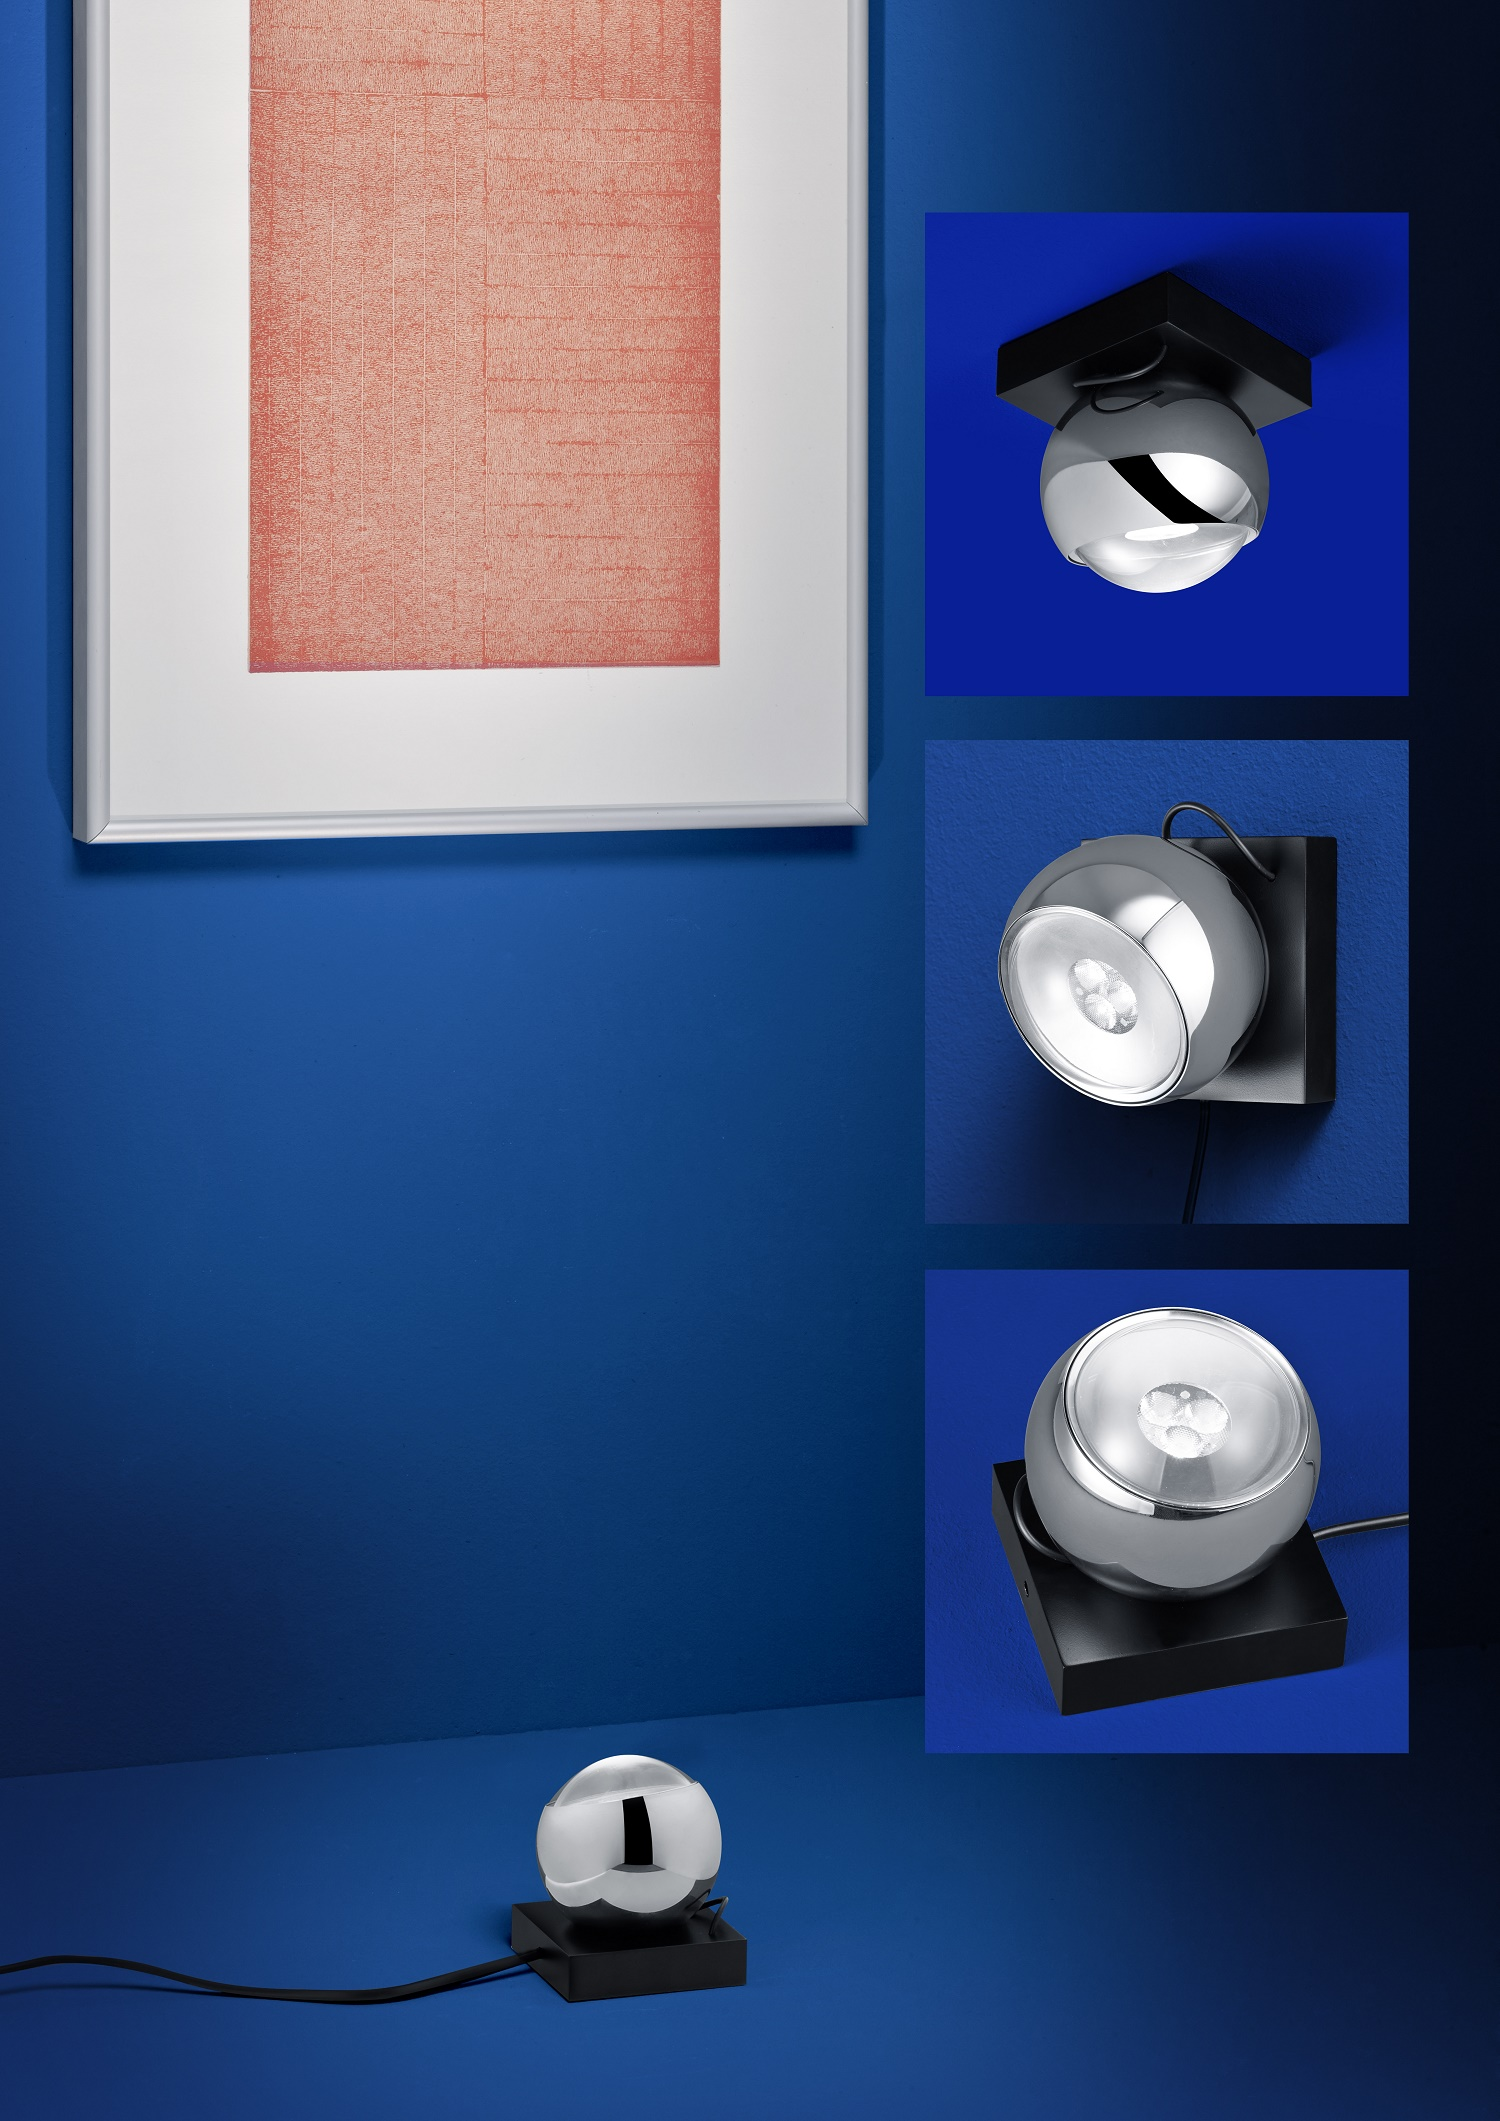 led designerleuchten jetzt g nstig kaufen qualit tsware24. Black Bedroom Furniture Sets. Home Design Ideas